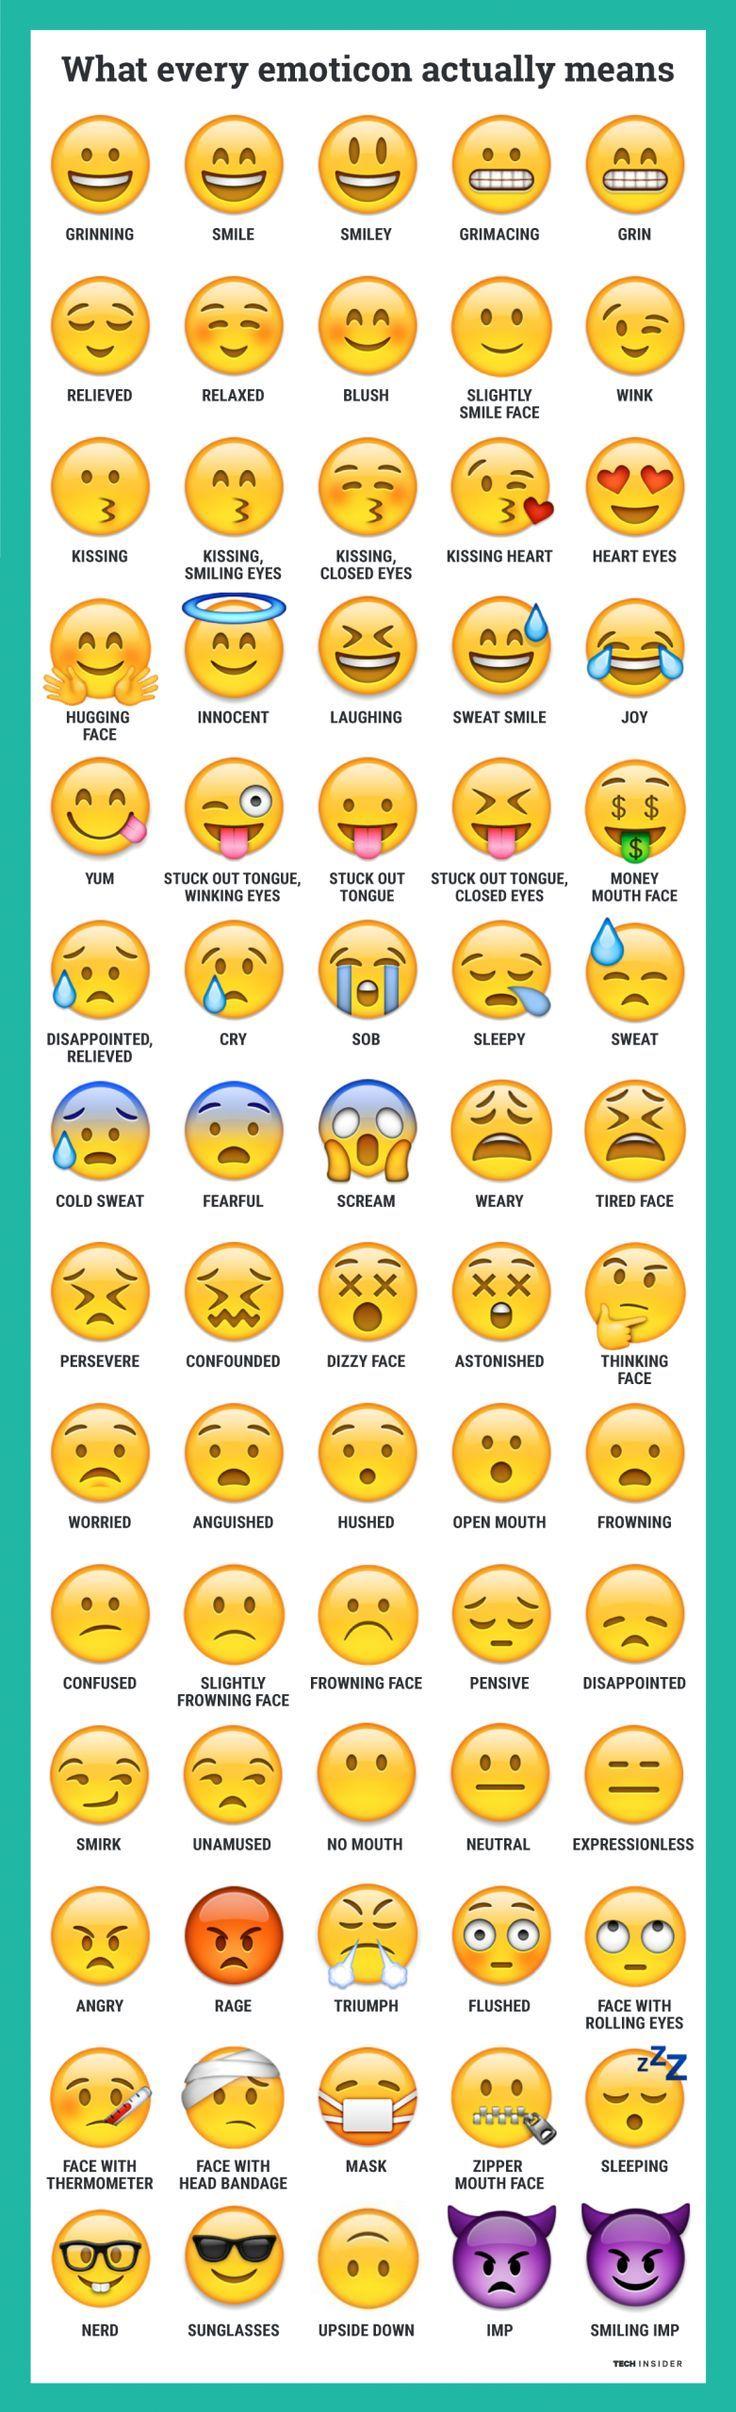 Best 25 emoji codes ideas on pinterest emoji online diy emoji emotions explained get more great info from champscorner by following pinterest buycottarizona